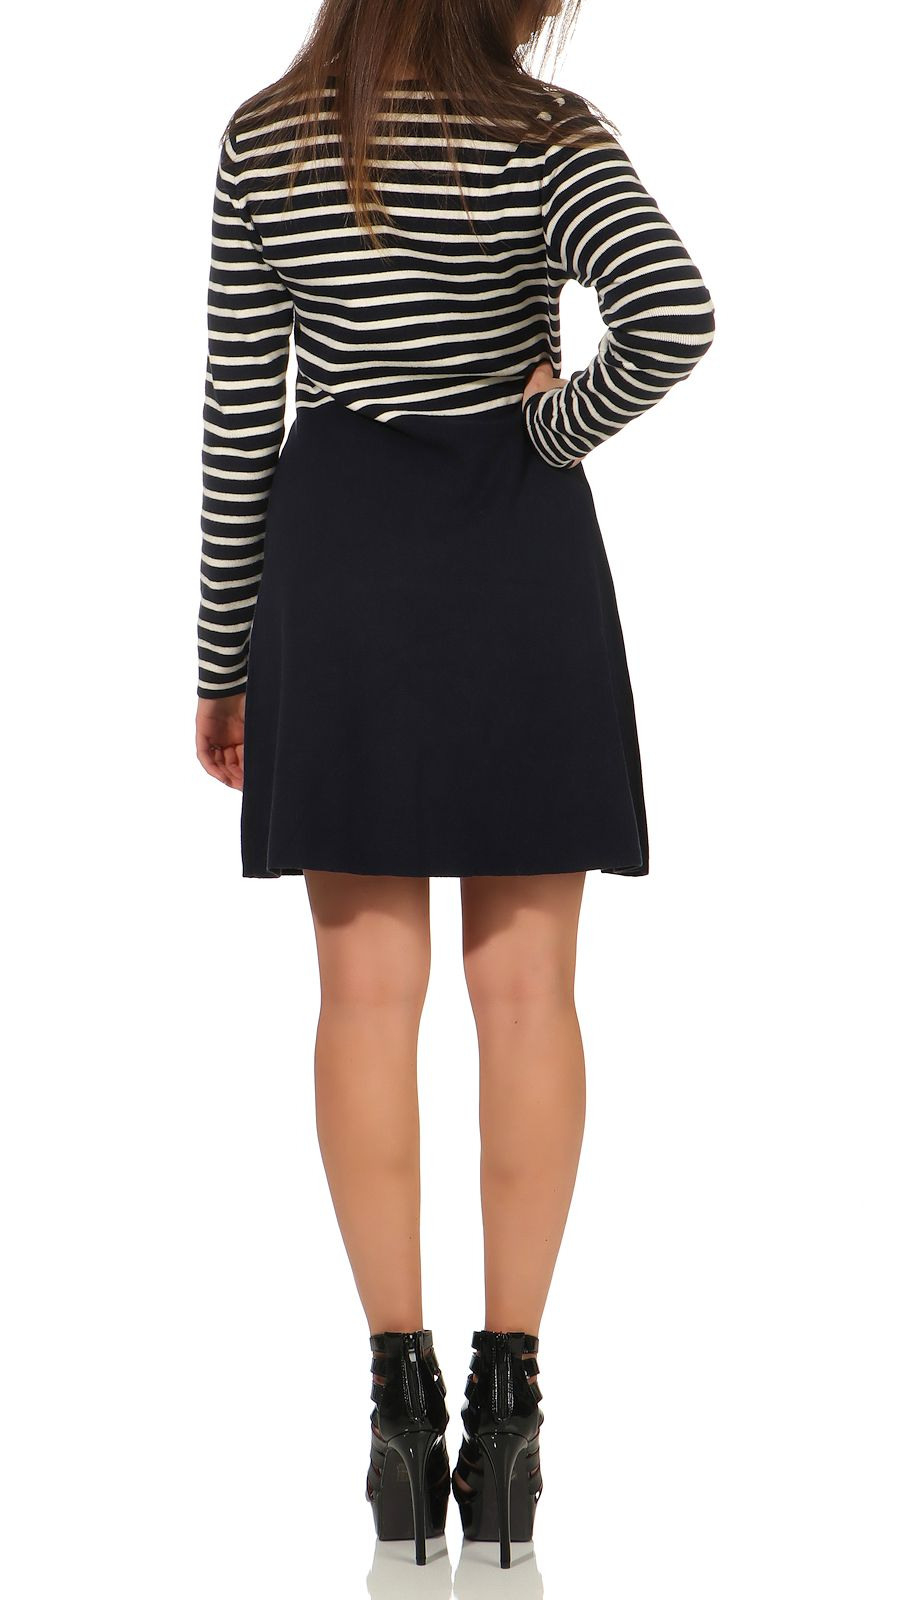 Vero Moda Damen Strickkleid Sailor  Röcke/ Kleider